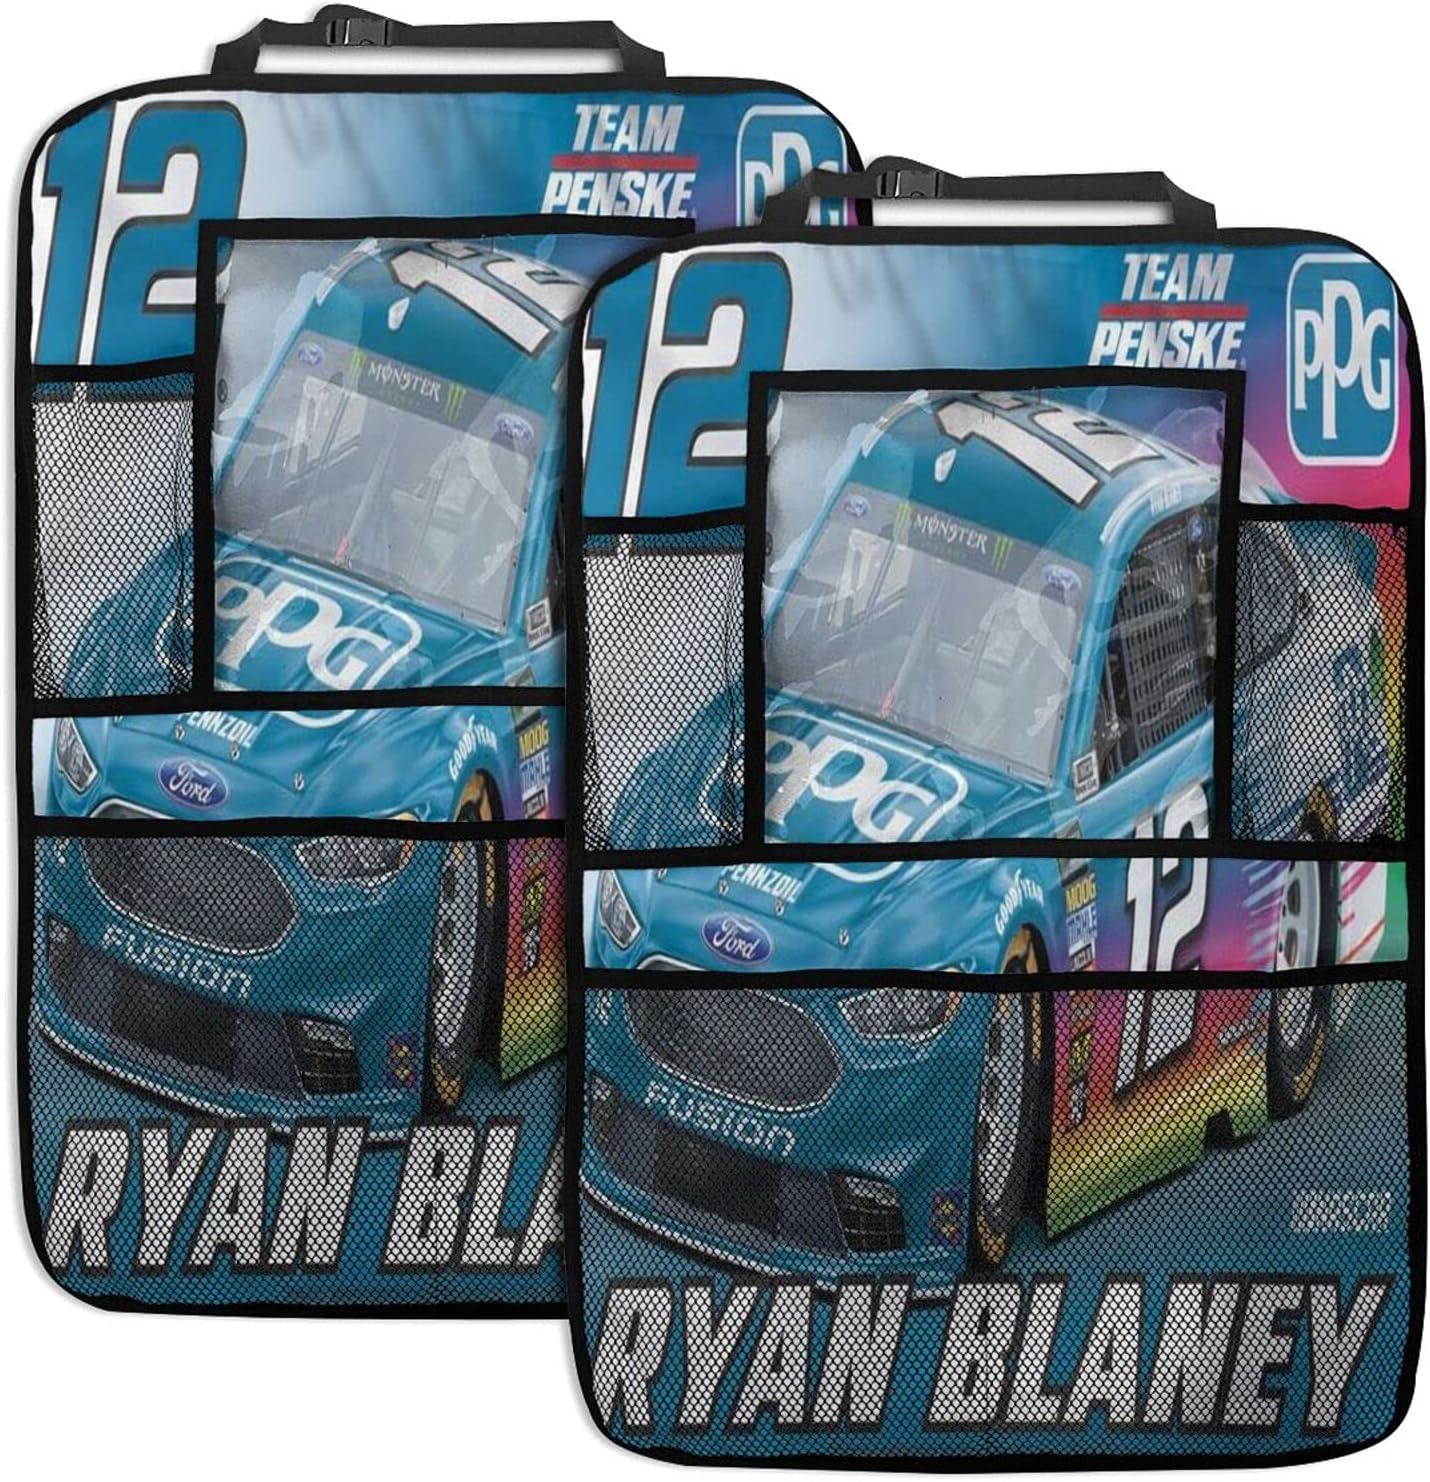 CiciShuo Ryan Inexpensive Blaney 2 Pack Organizer Car Foldable Bargain sale Backseat